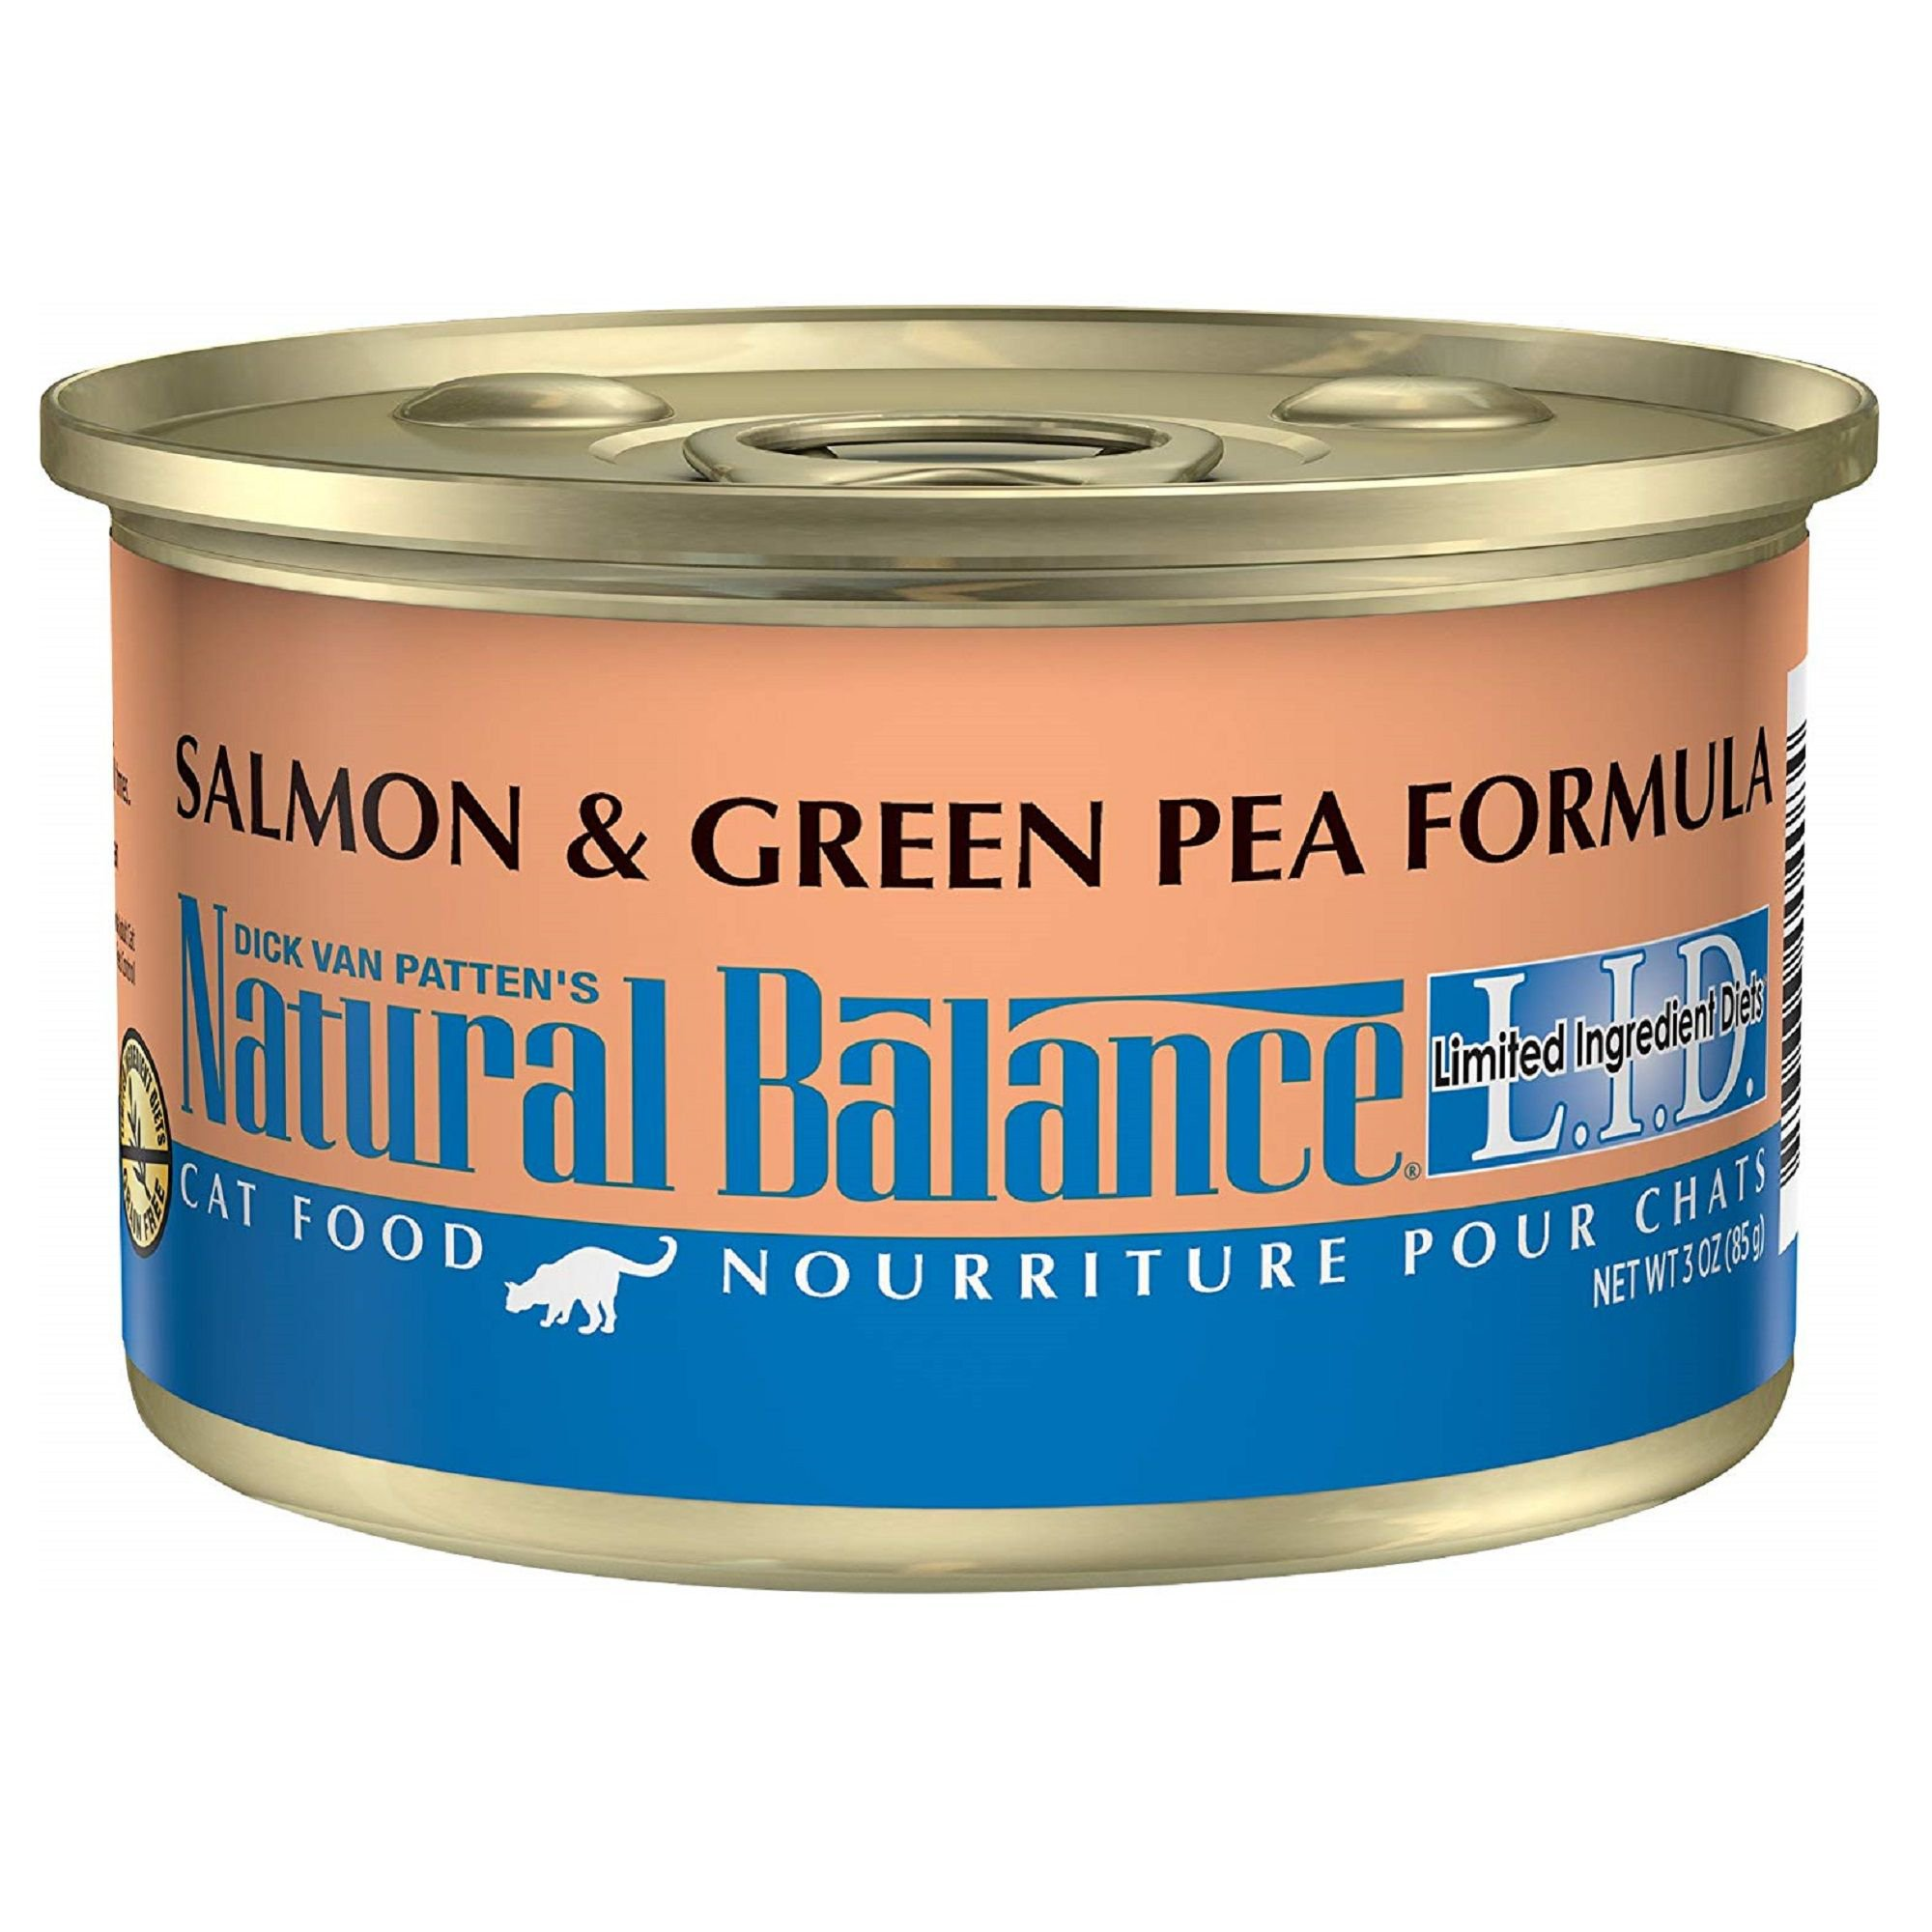 Natural Balance L.I.D. Salmon & Green Pea Formula Canned Cat Food